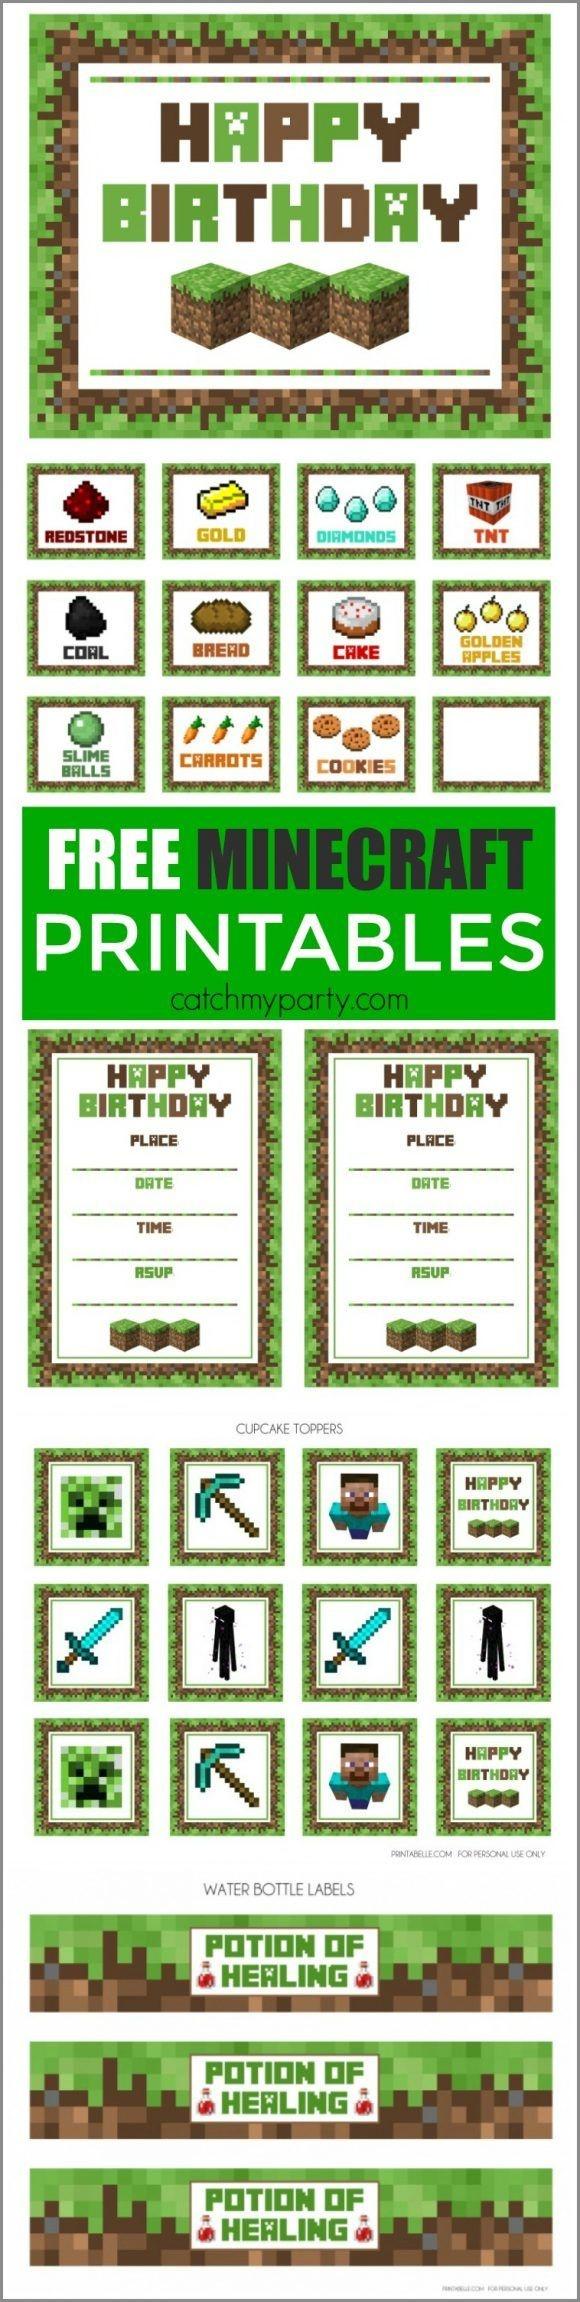 Free Minecraft Printables | Minecraft Party Ideas | Minecraft Party - Free Minecraft Party Printables